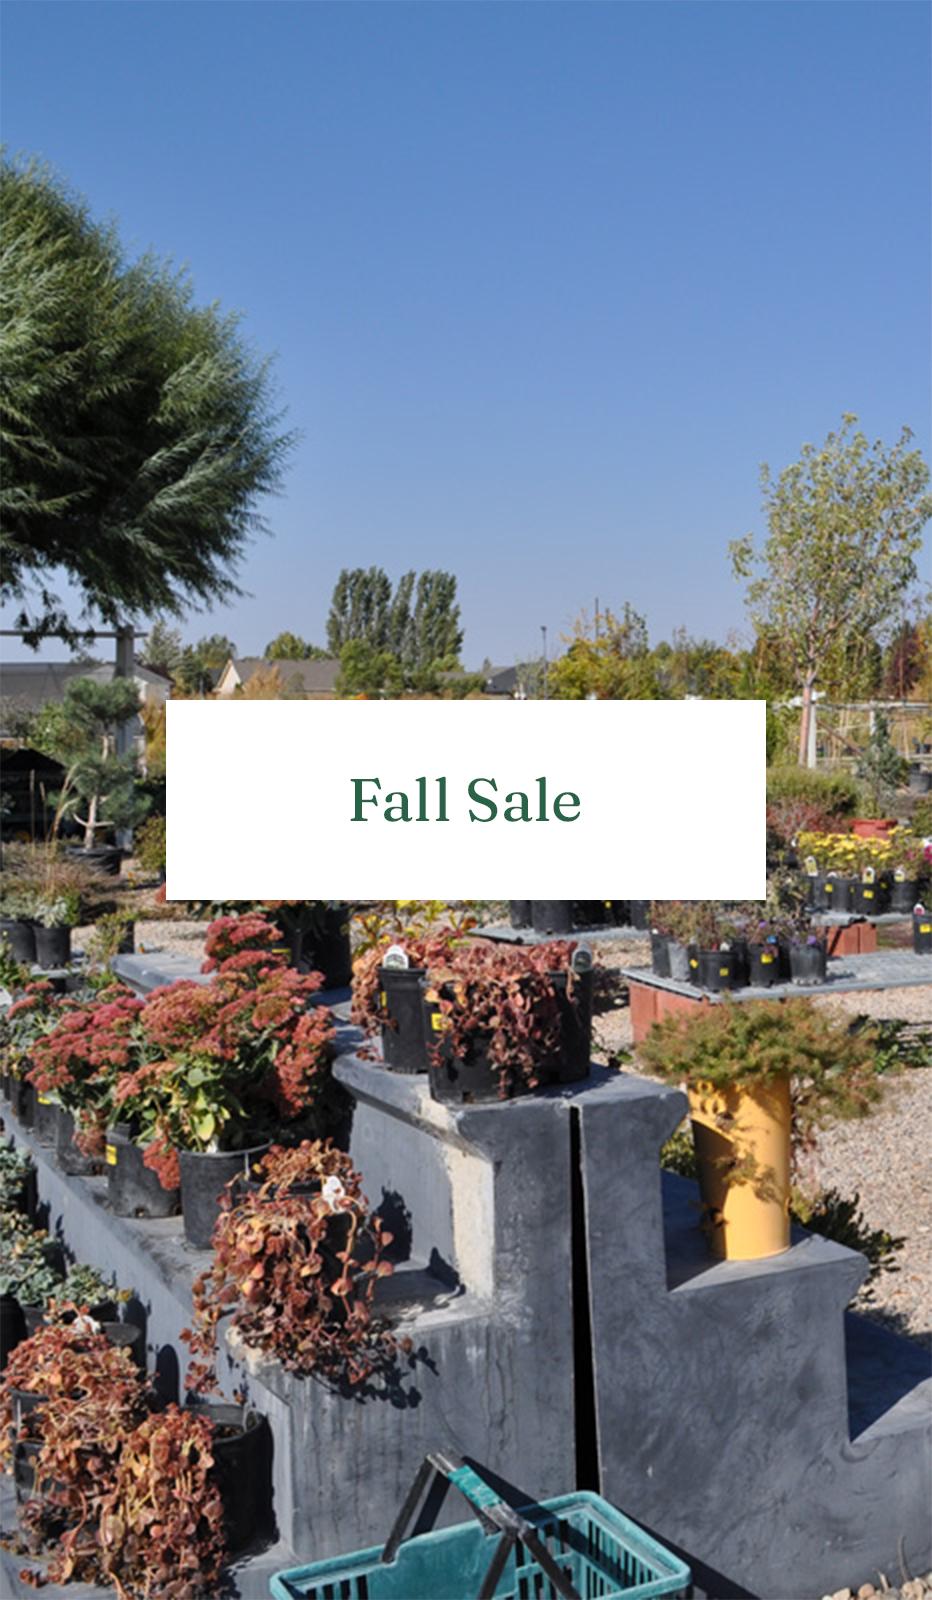 Fall Sale Mobile